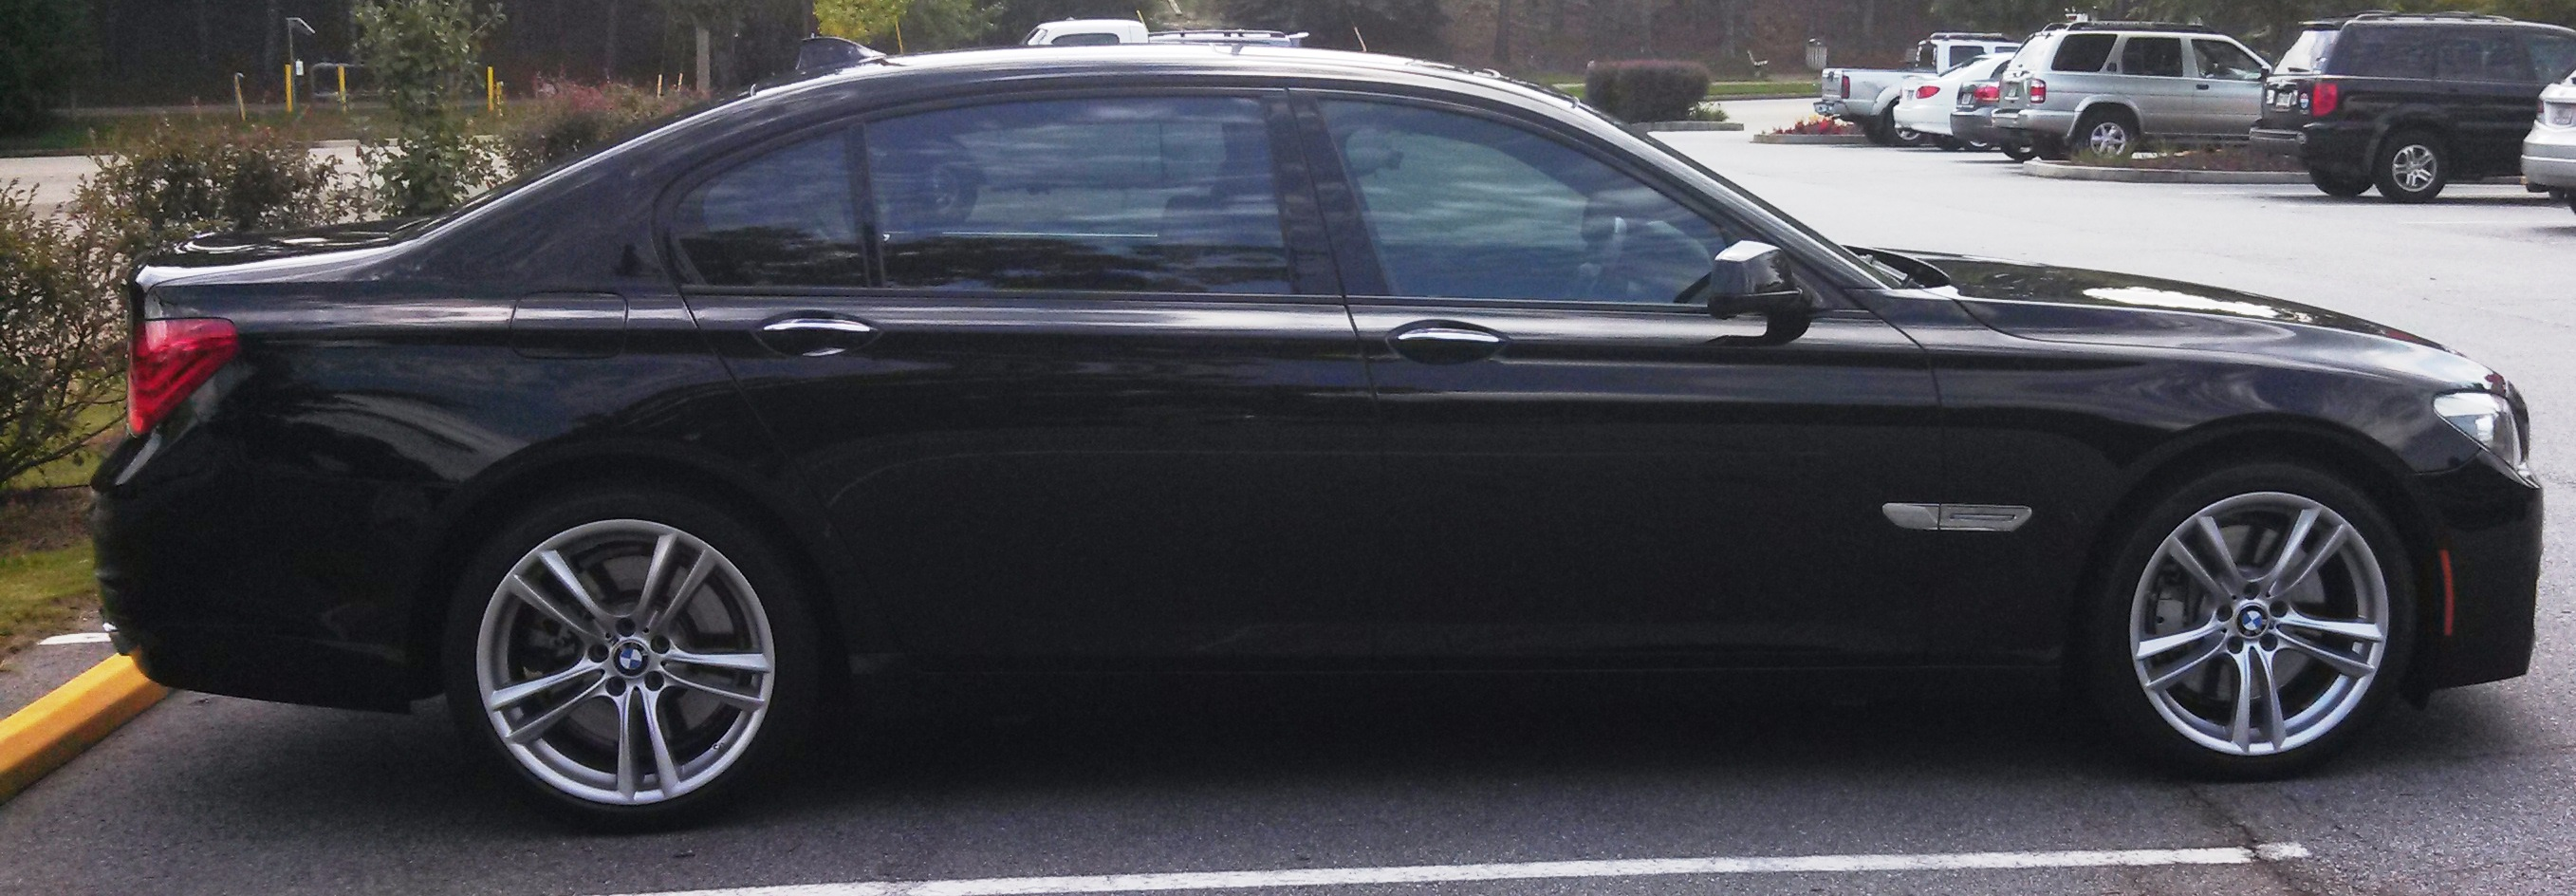 2011 BMW 7-Series 750Li 4D Sedan | Diminished Value Car Appraisal